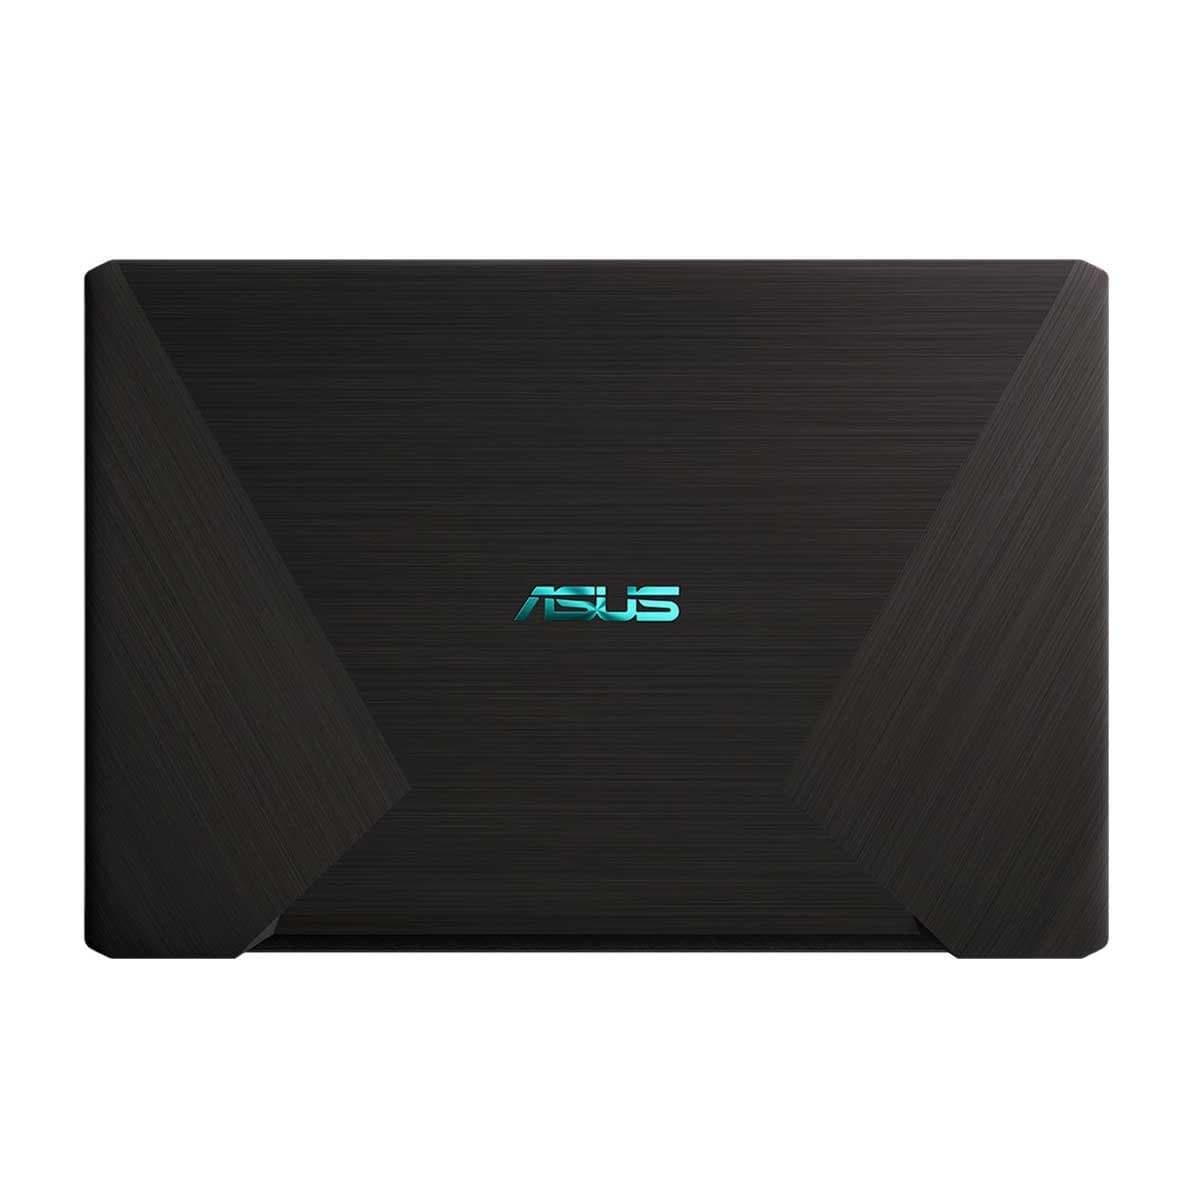 "Laptop Gamer Asus 15.6"" X570Zd-Dm161T R5-2500U"